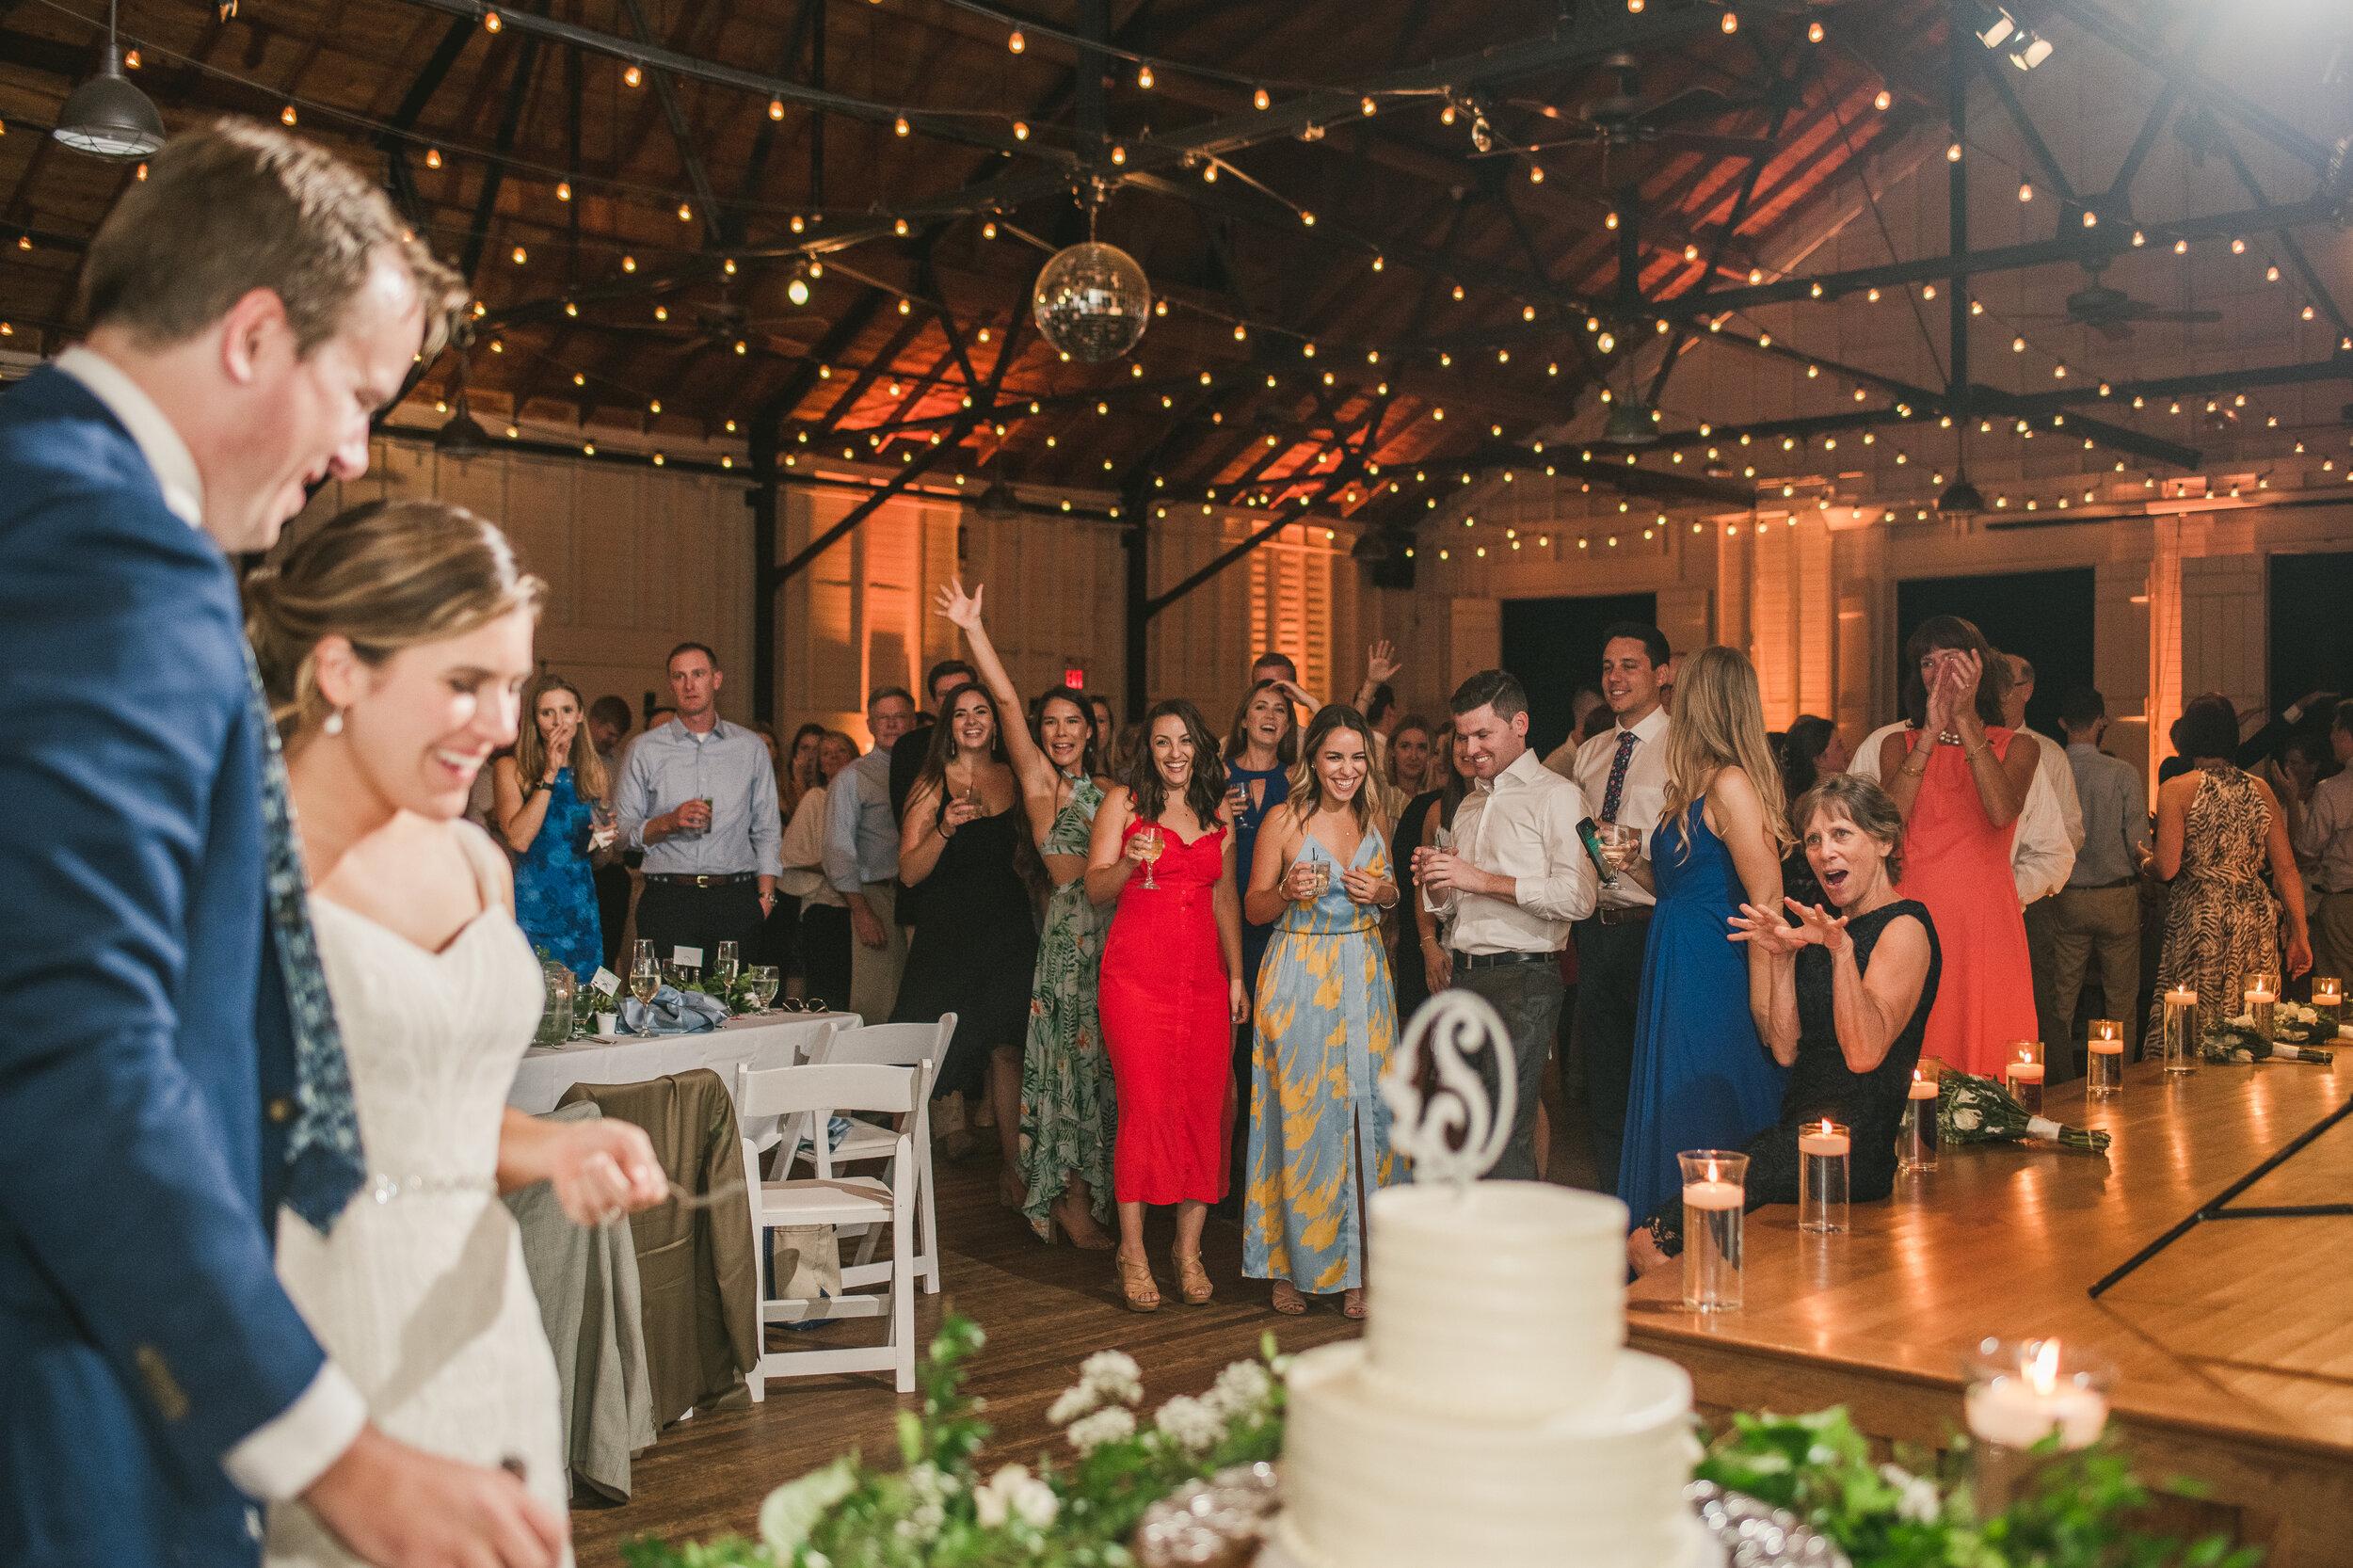 Becca-Cassin-Wedding-Favorites-107-photo.jpg